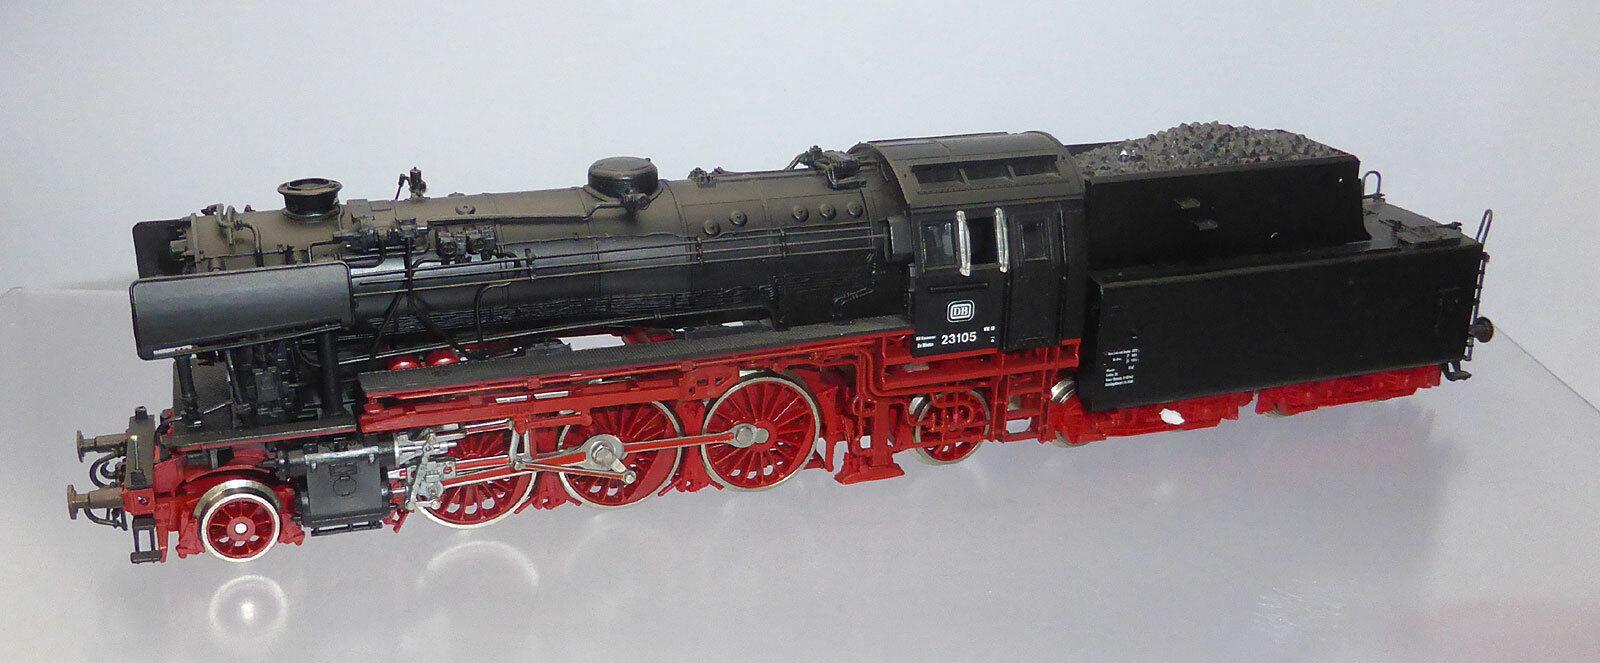 Roco 04120; schlepptenderlok 23105 db j087